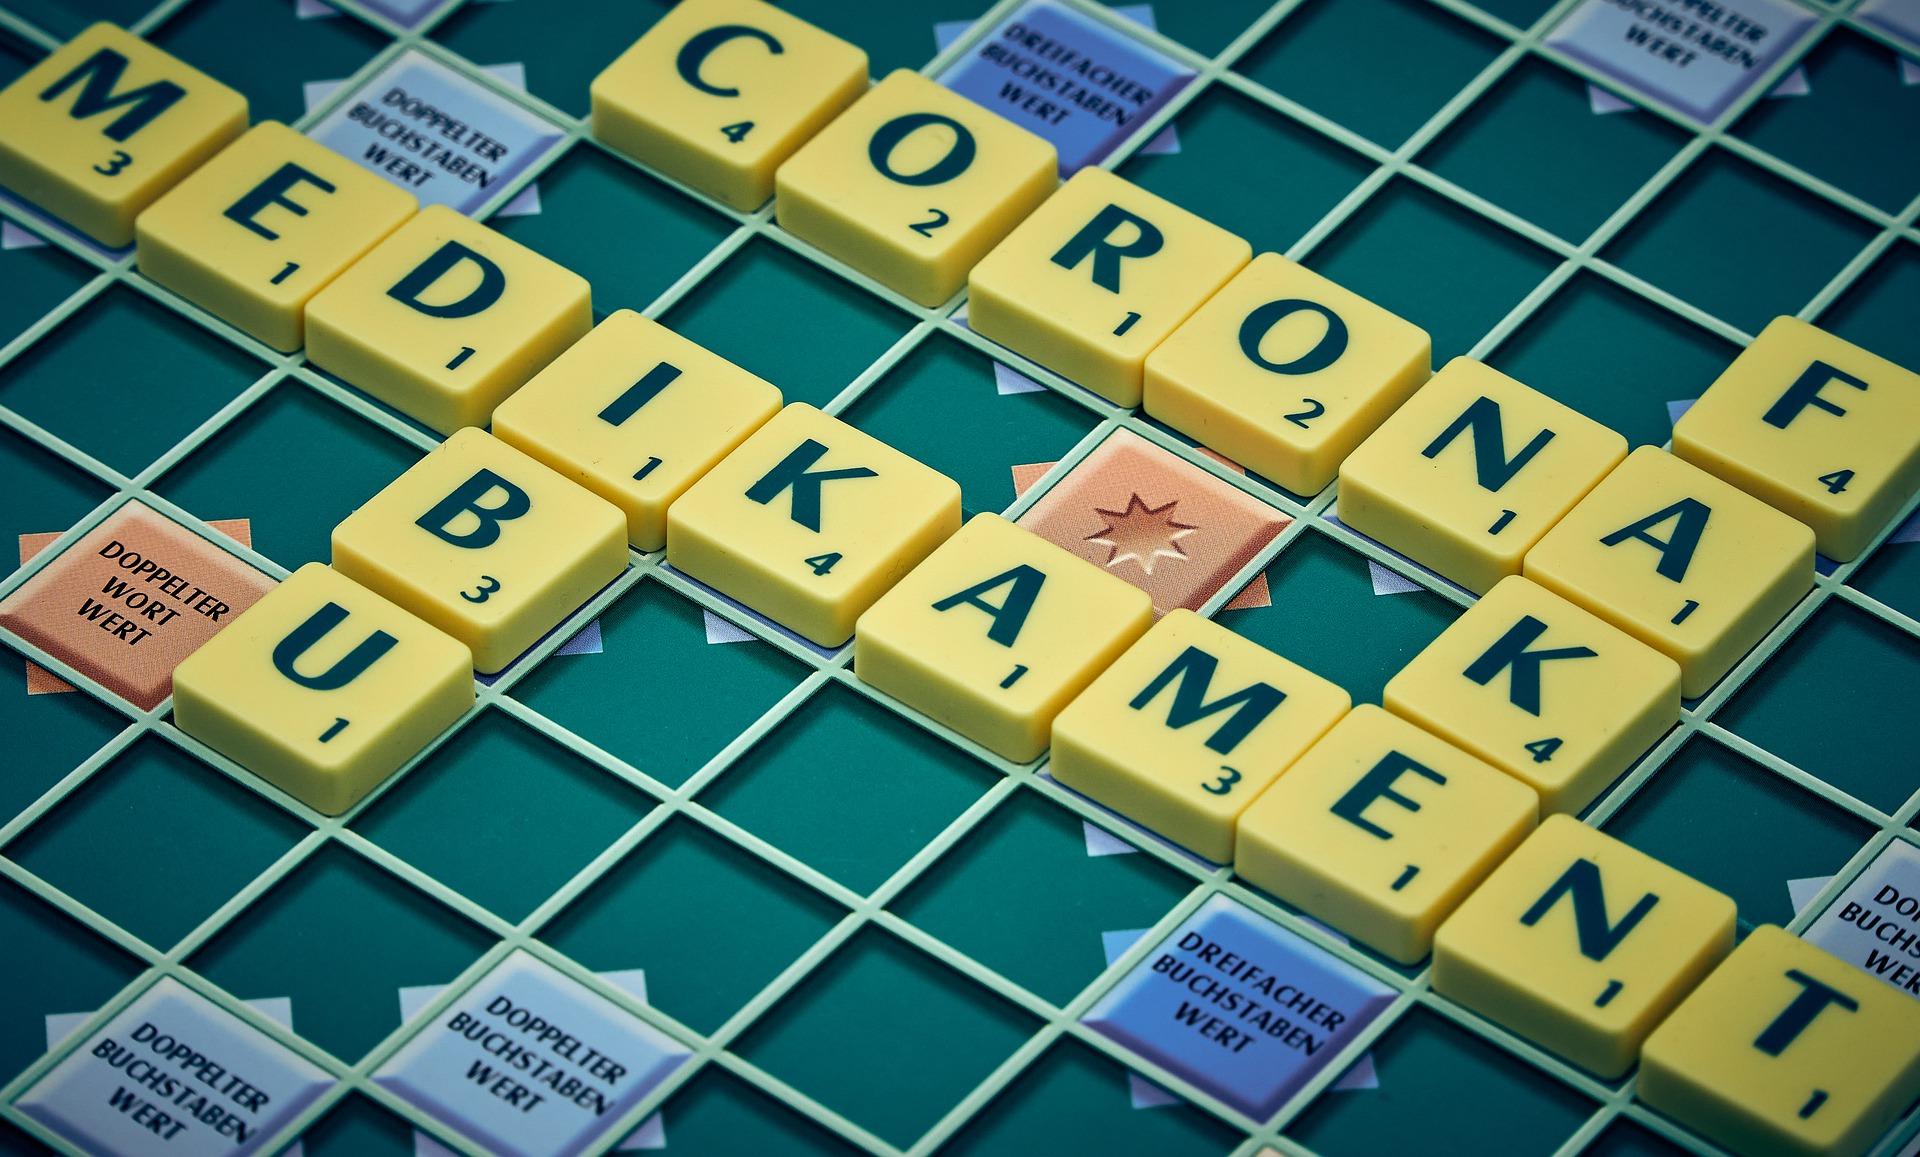 Corona: Horror oder Hoax?